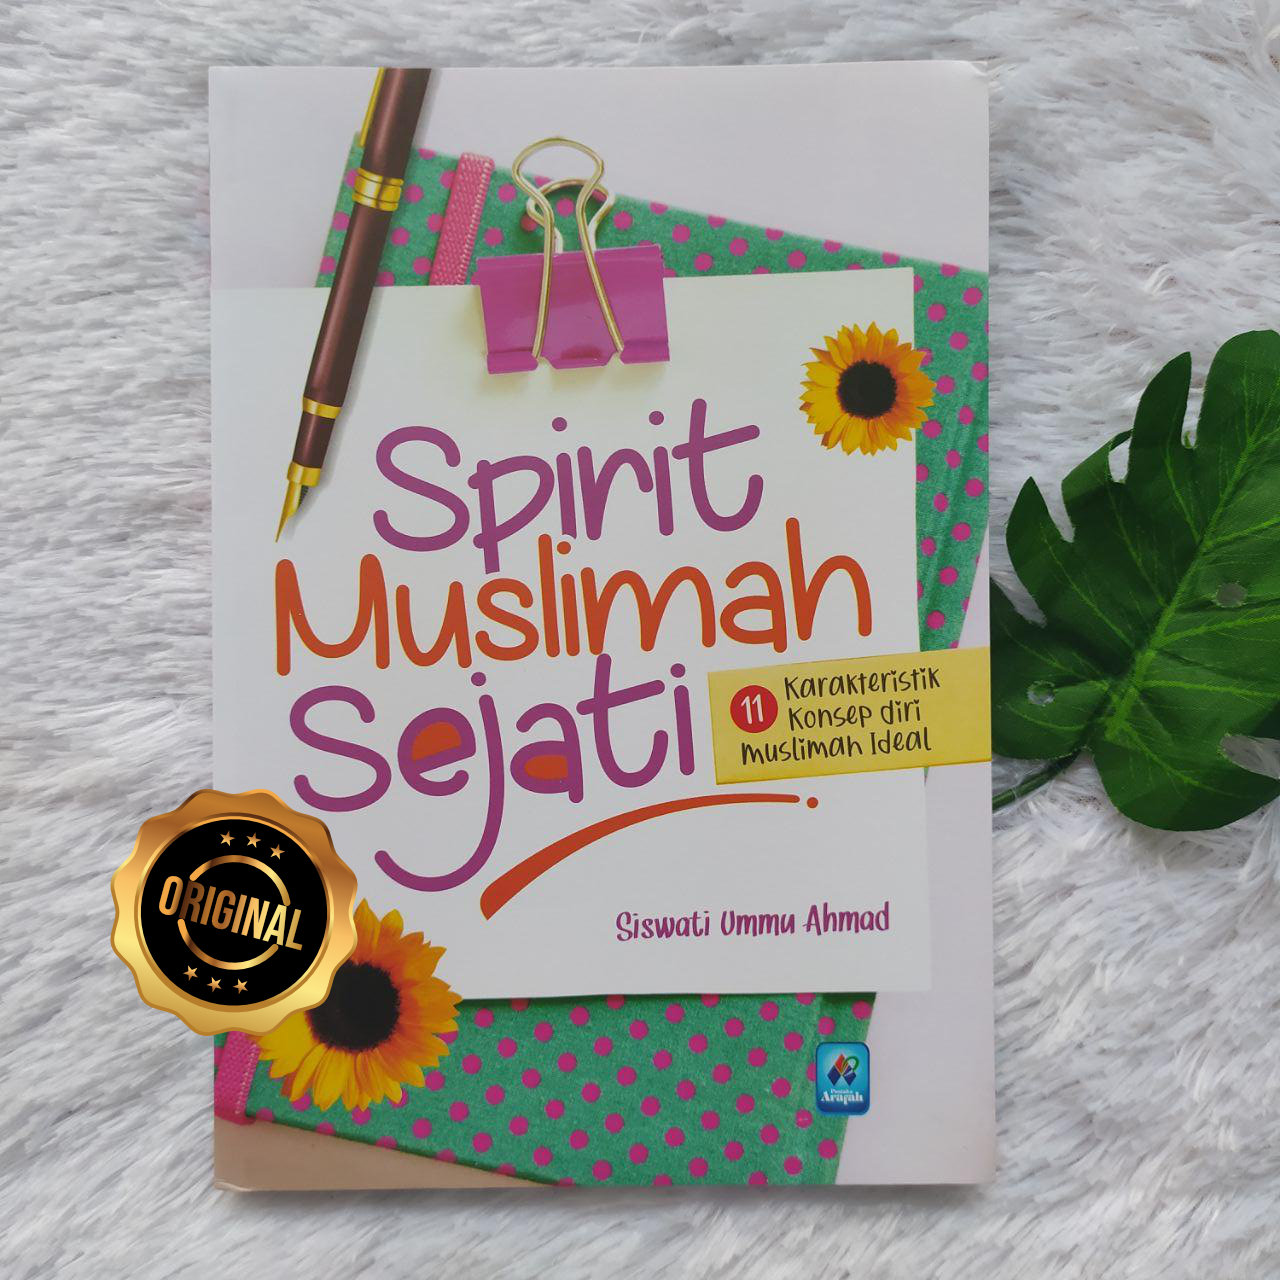 Buku Spirit Muslimah Sejati 11 Karakteristik Muslimah Ideal